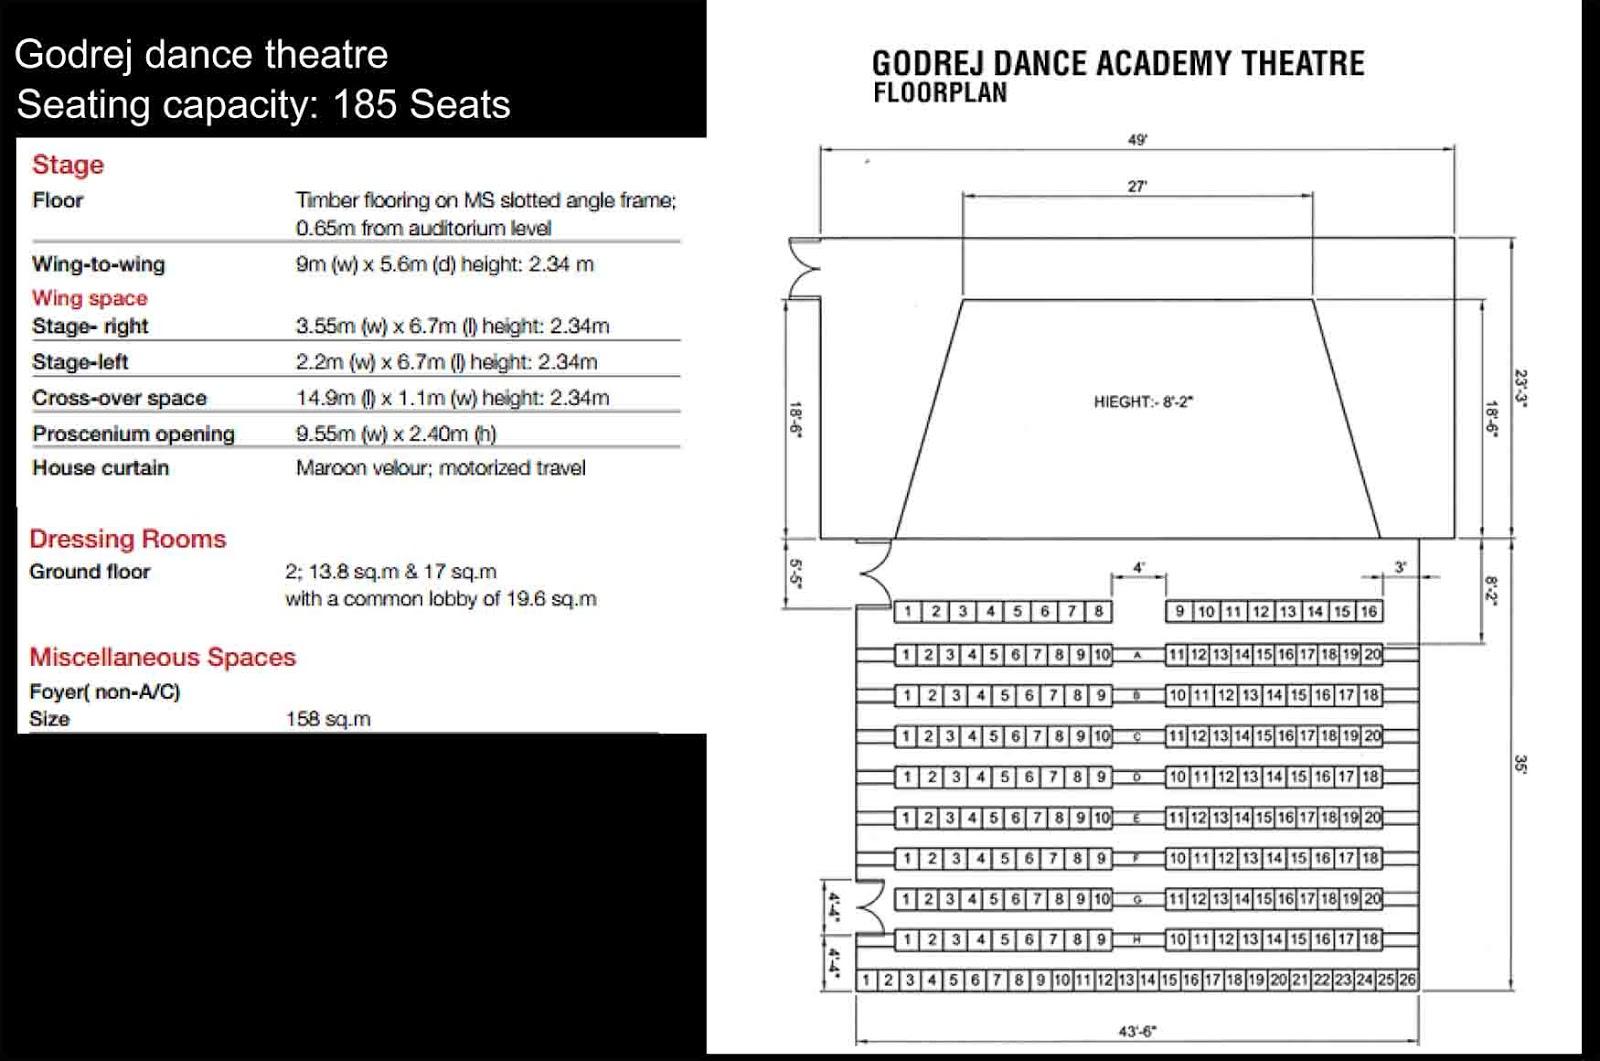 ncpa-Godrej-dance-theatre